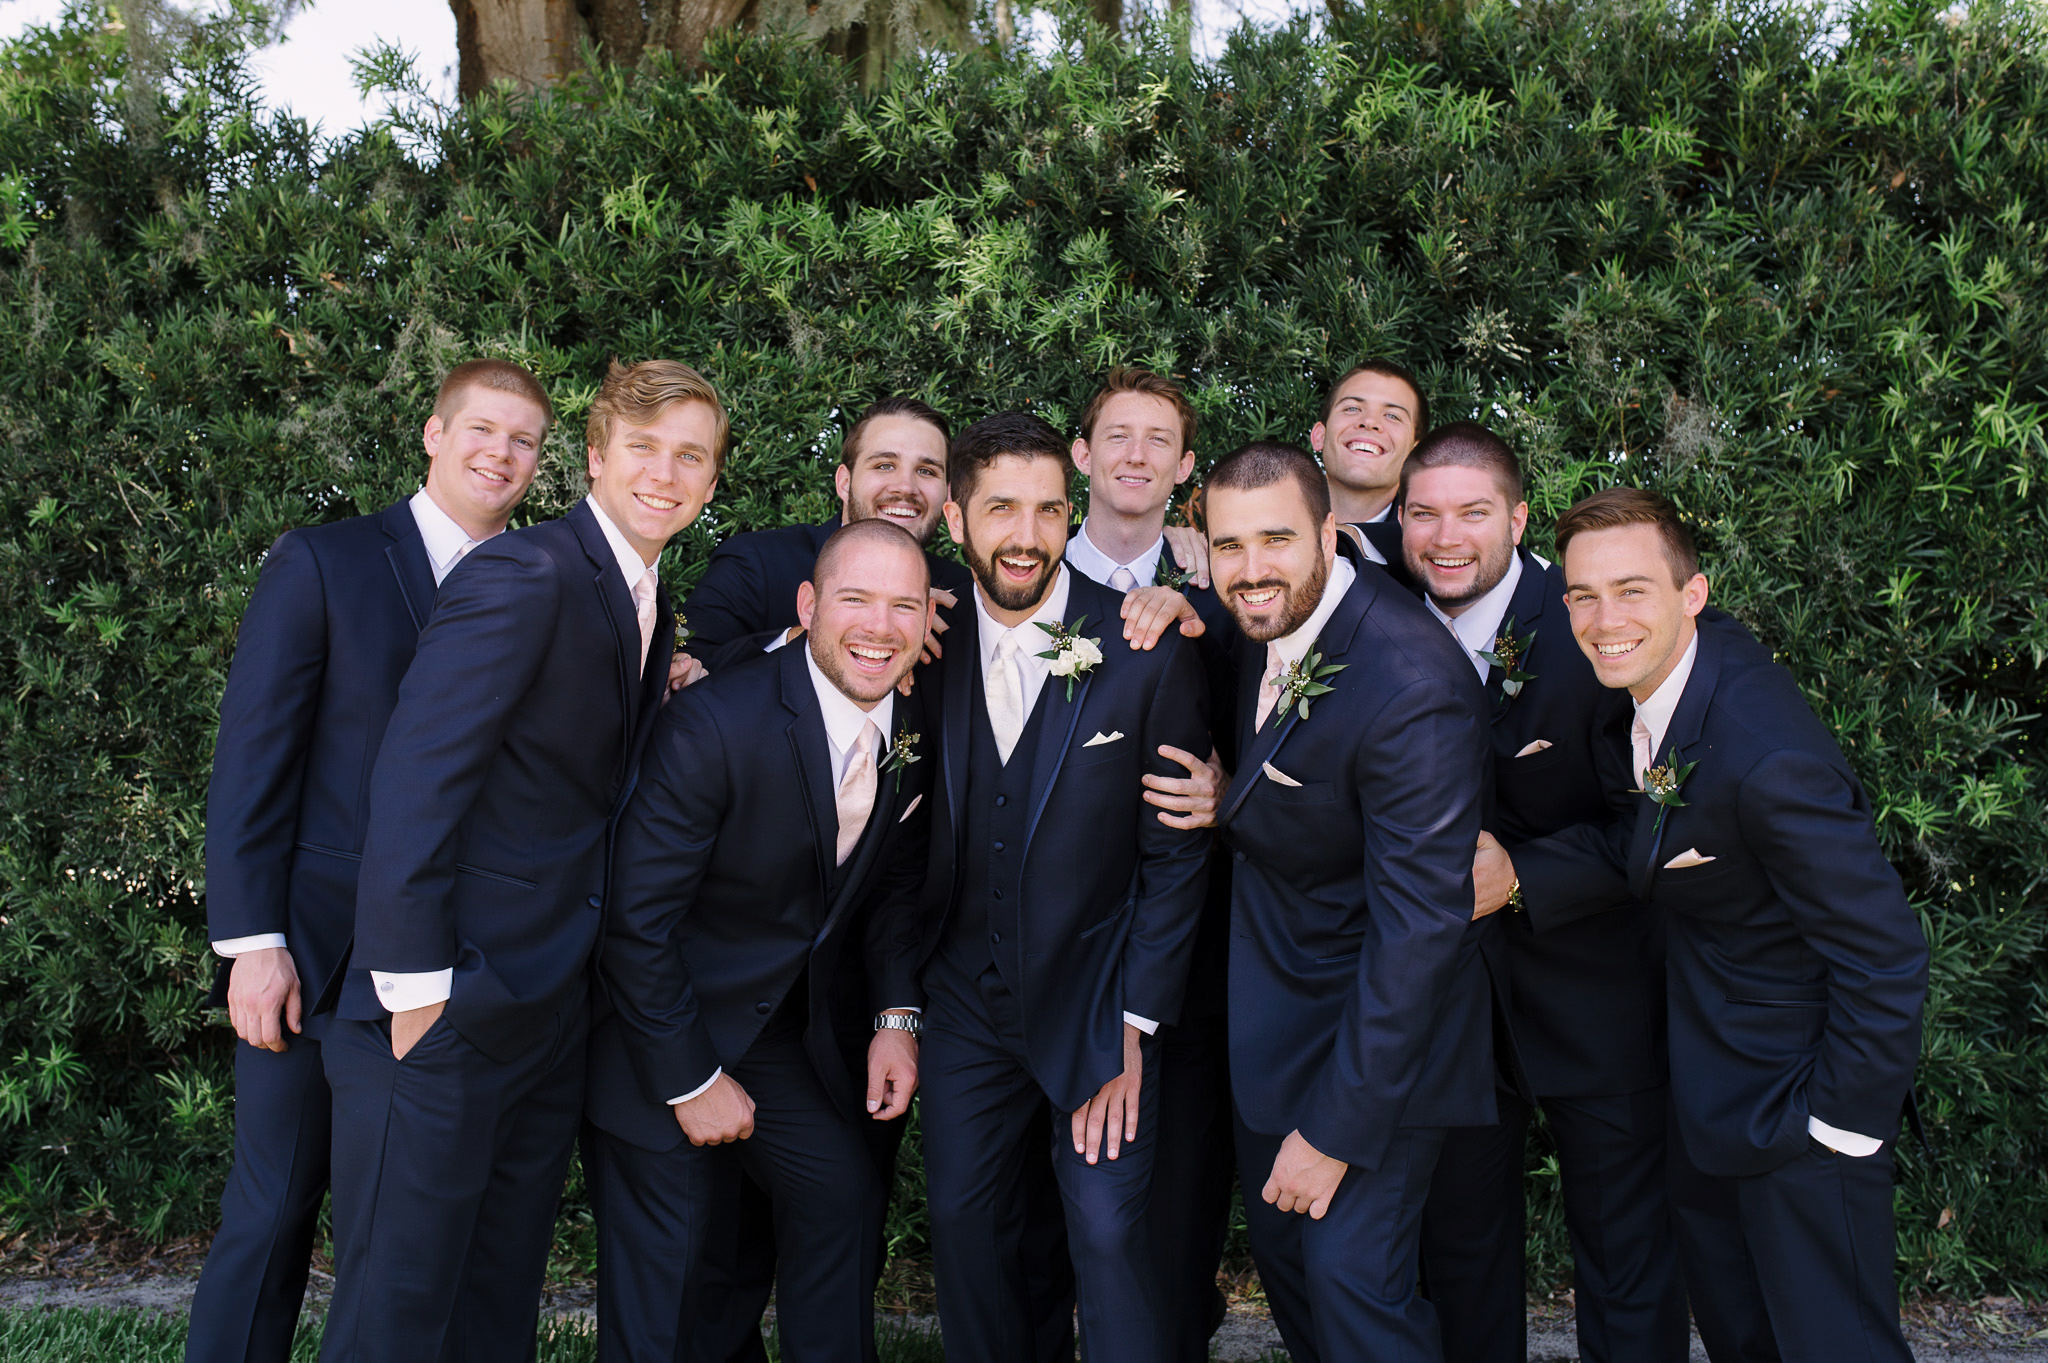 Tavares+Pavilion+on+the+Lake+Wedding+Florida_013.jpg